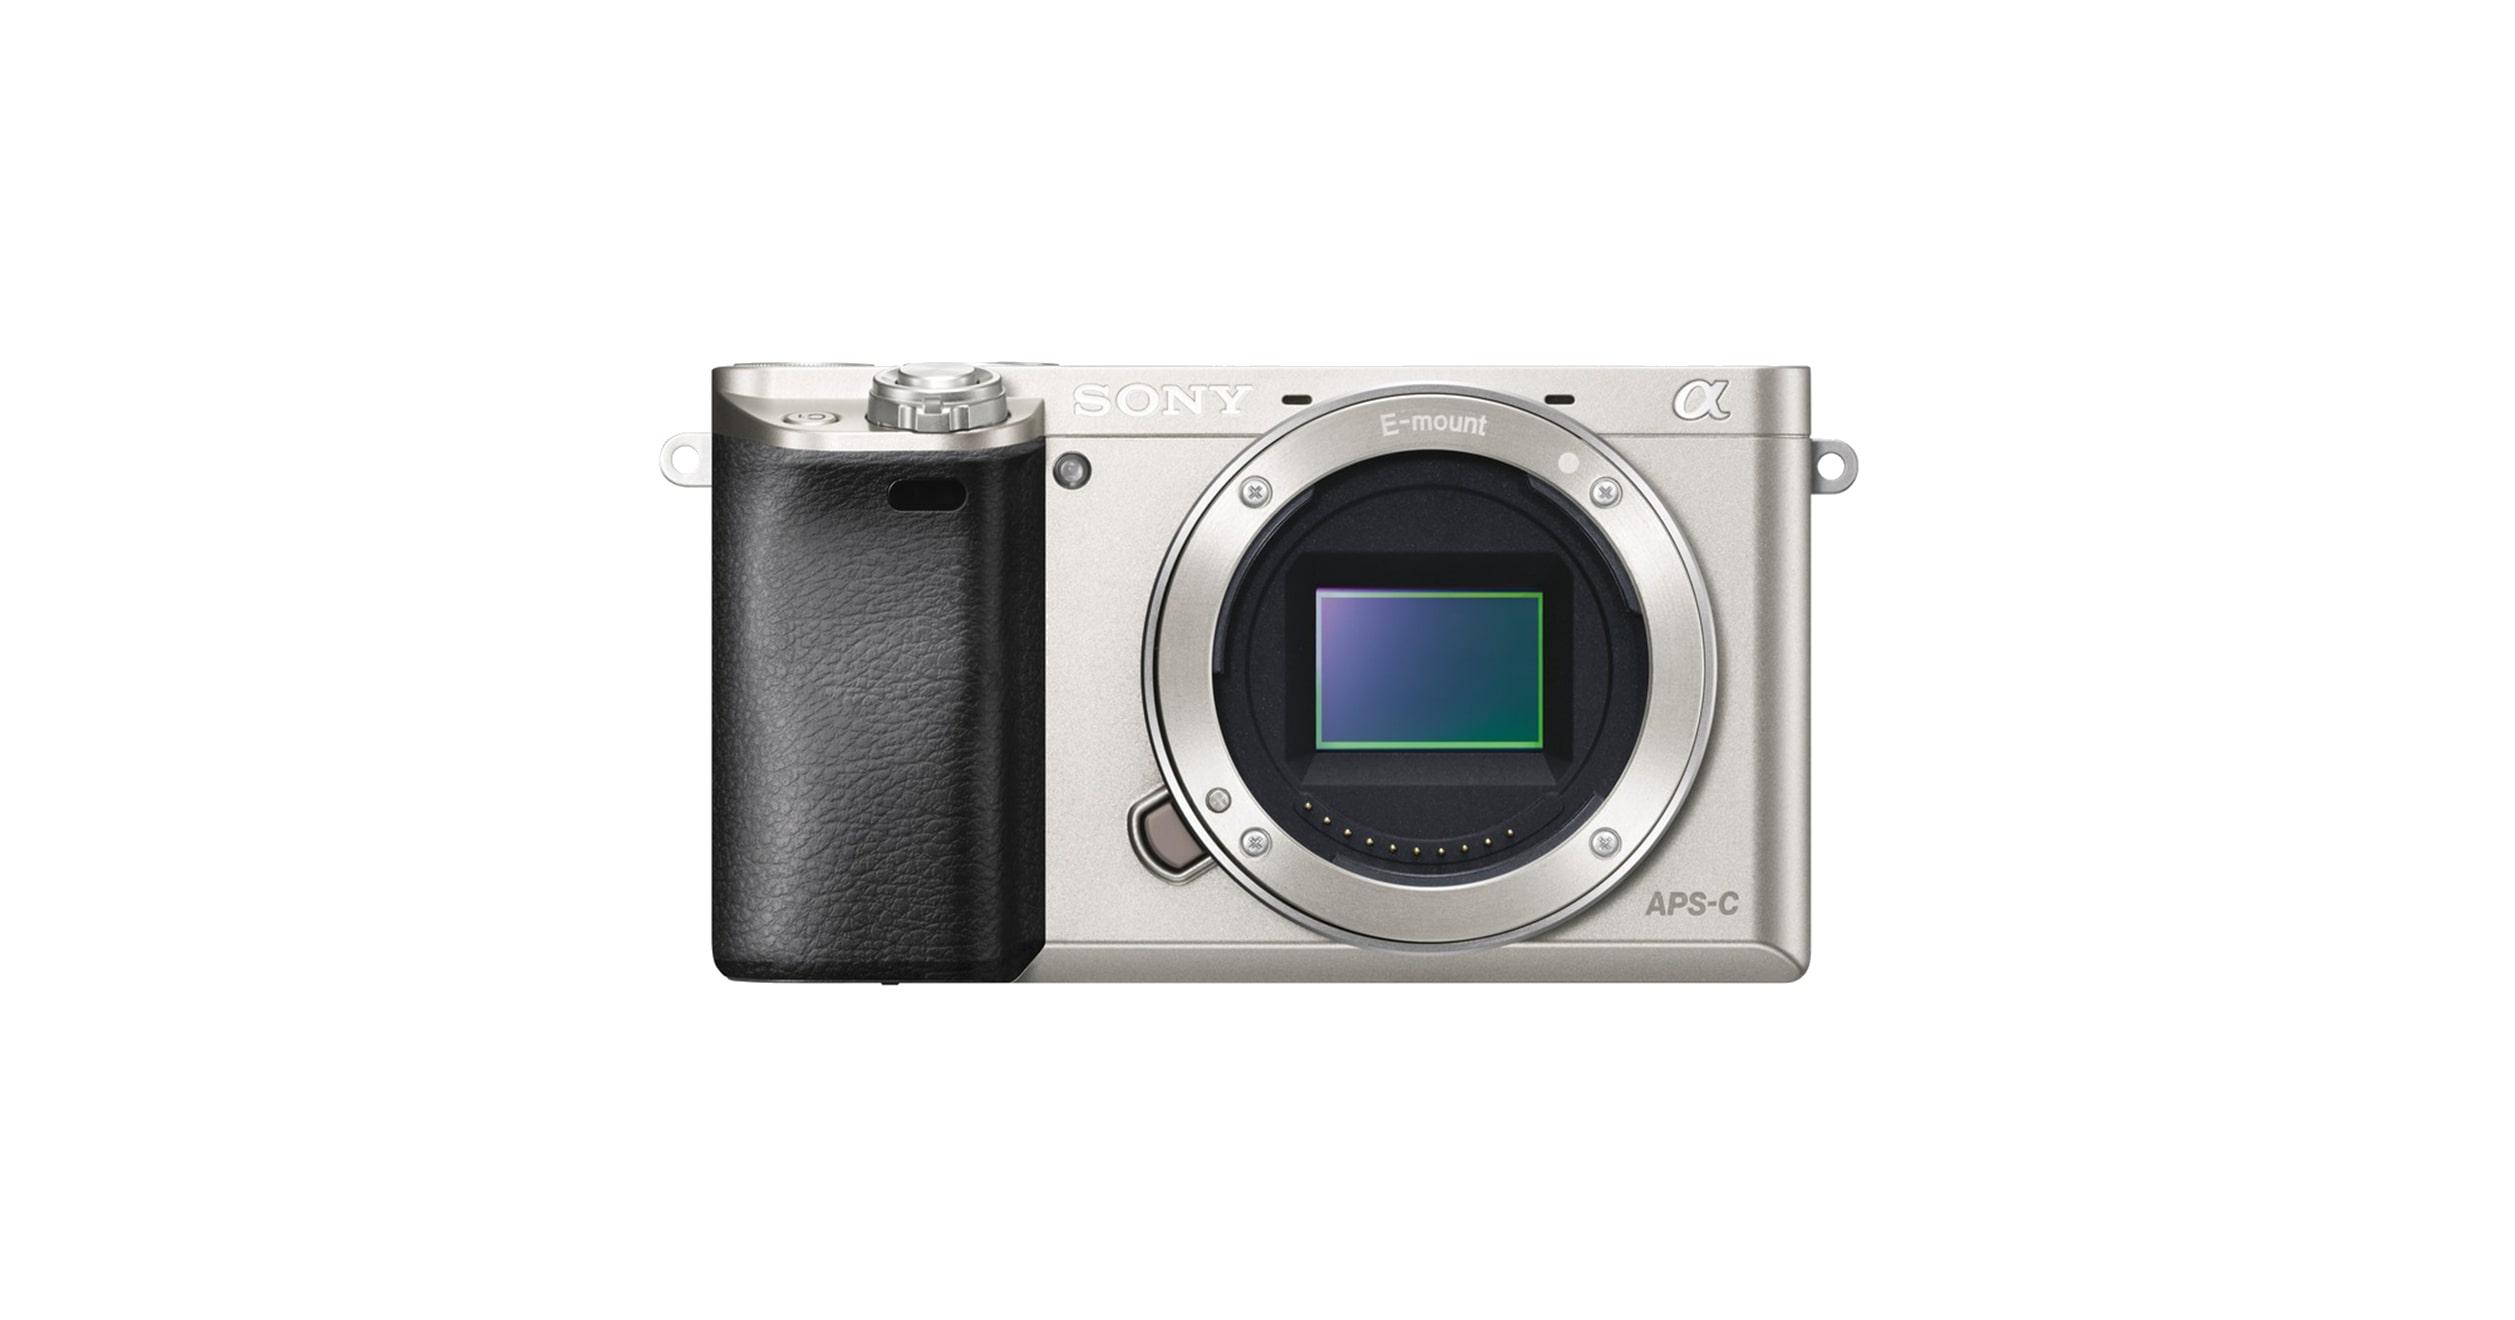 Hybrid Camera Interchangeable Lens A6000 Sony Ph Digital Diagram Film My Journey